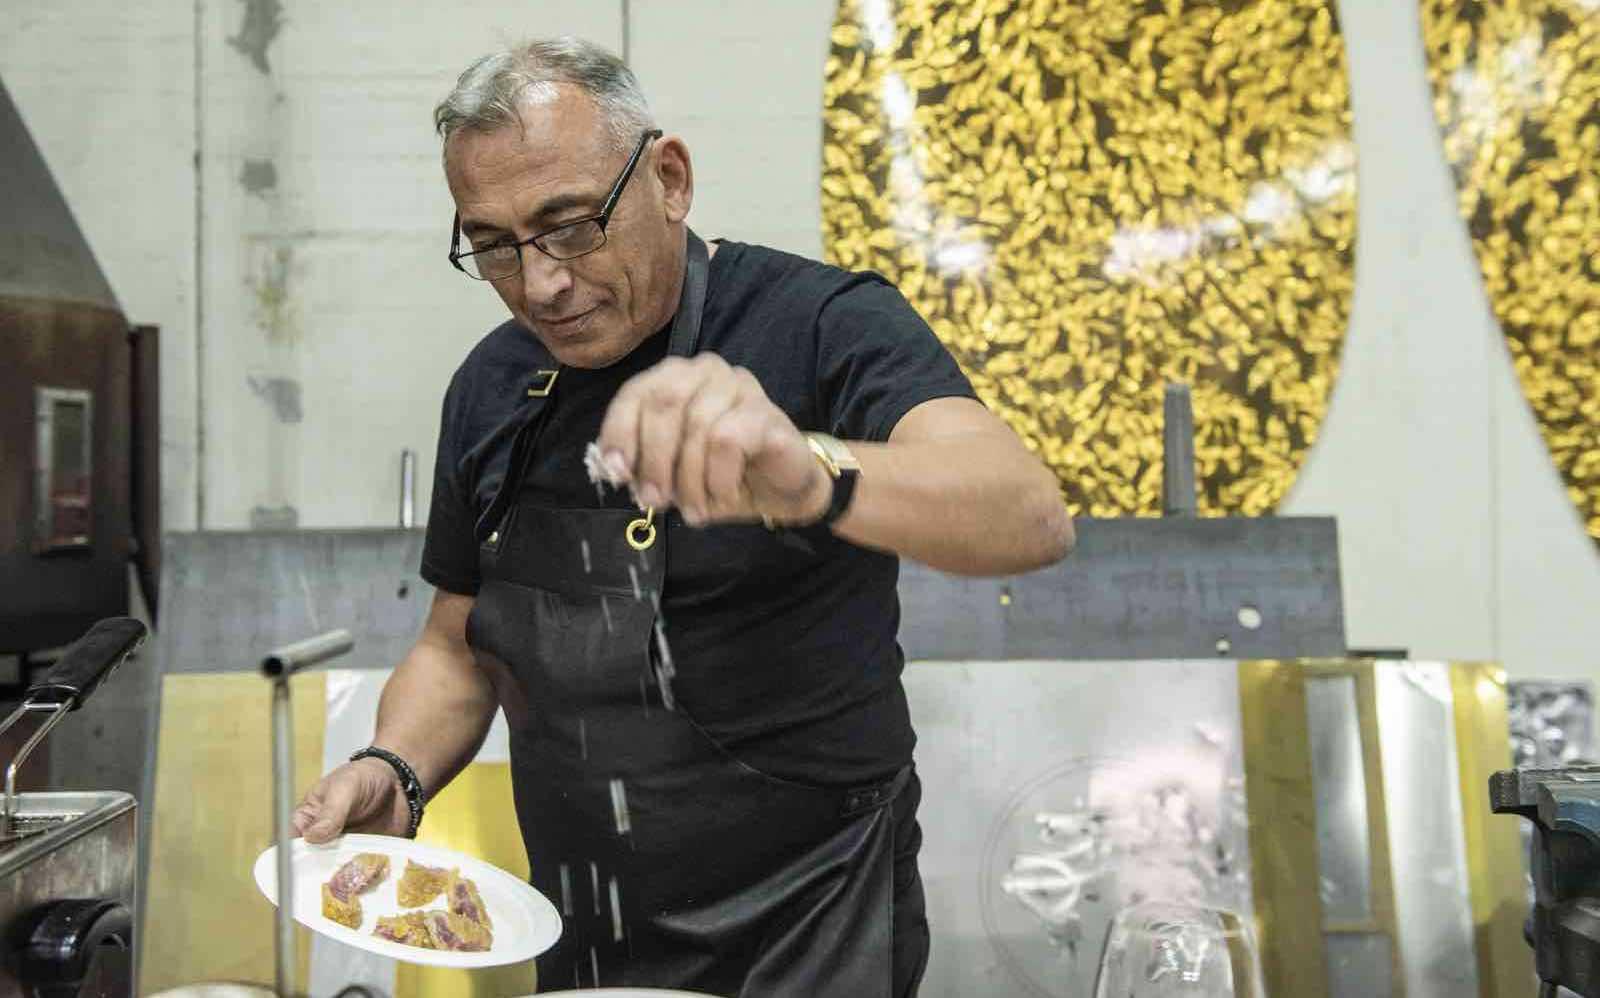 REAL RISOTTO: The famous Italian Chef: Massimo Minutelli makes fake risotto in Lucca.